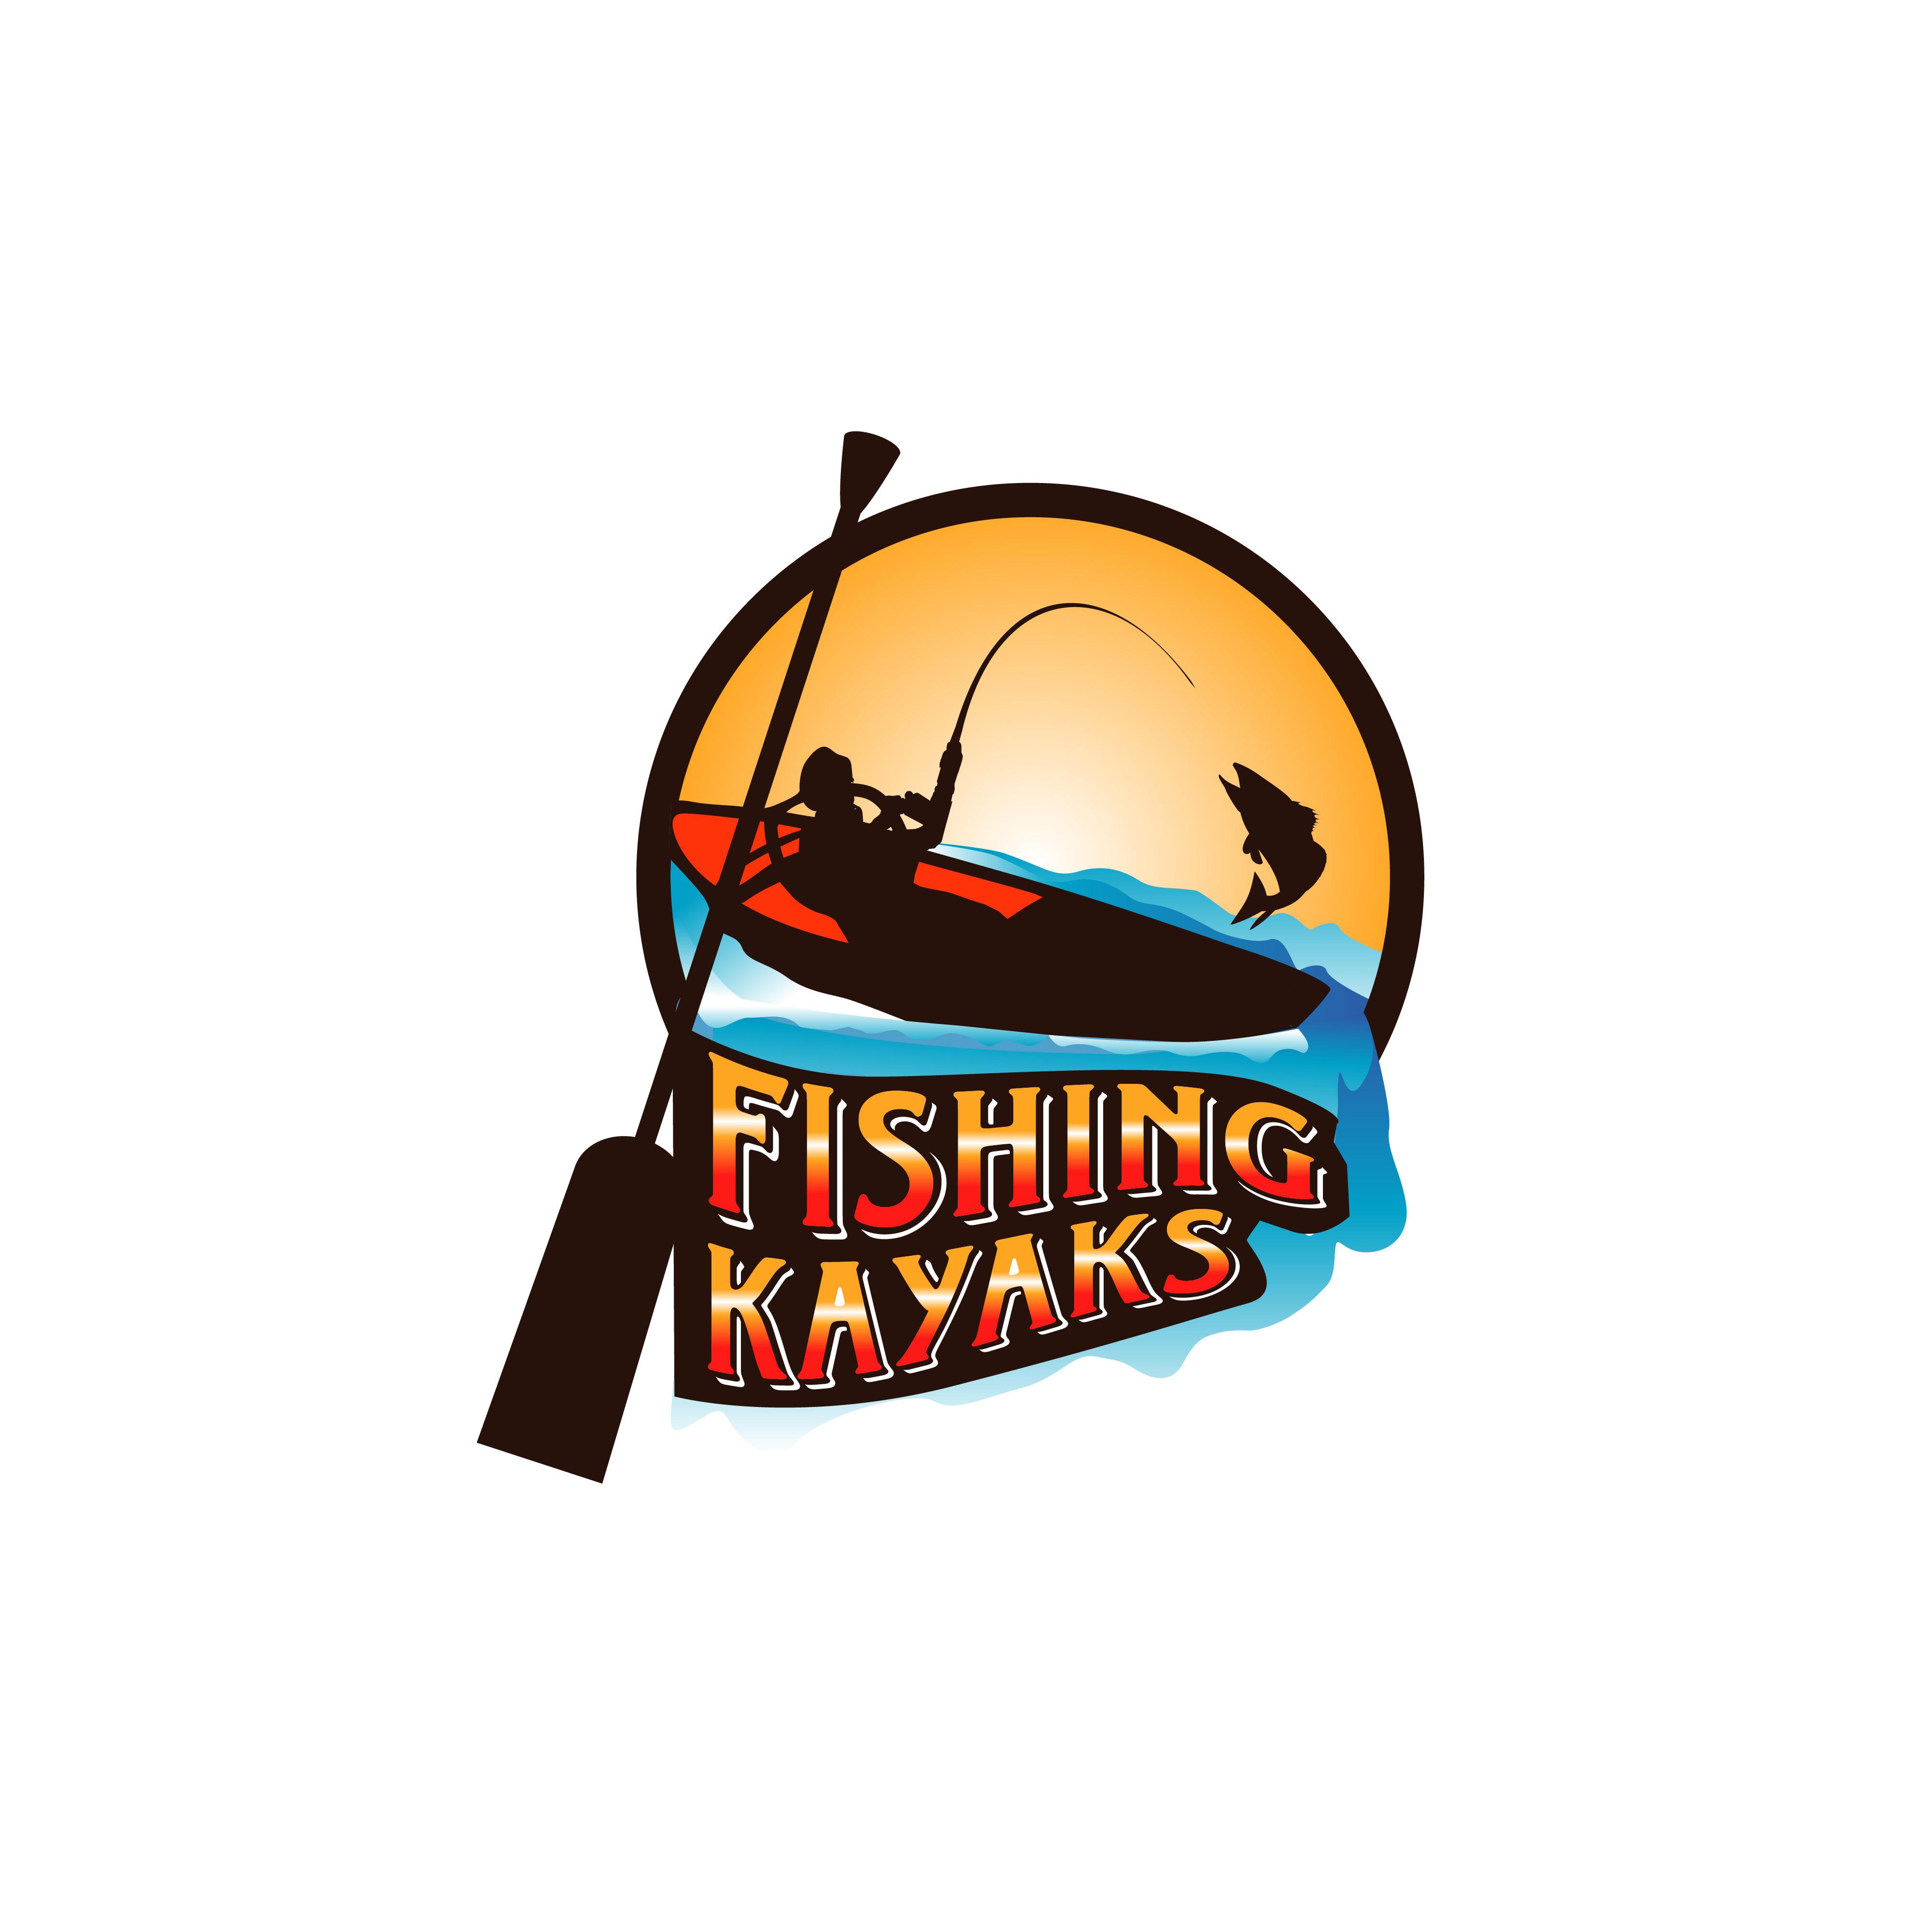 Download Fishing Kayaks Logo - Download Free Vectors, Clipart ...